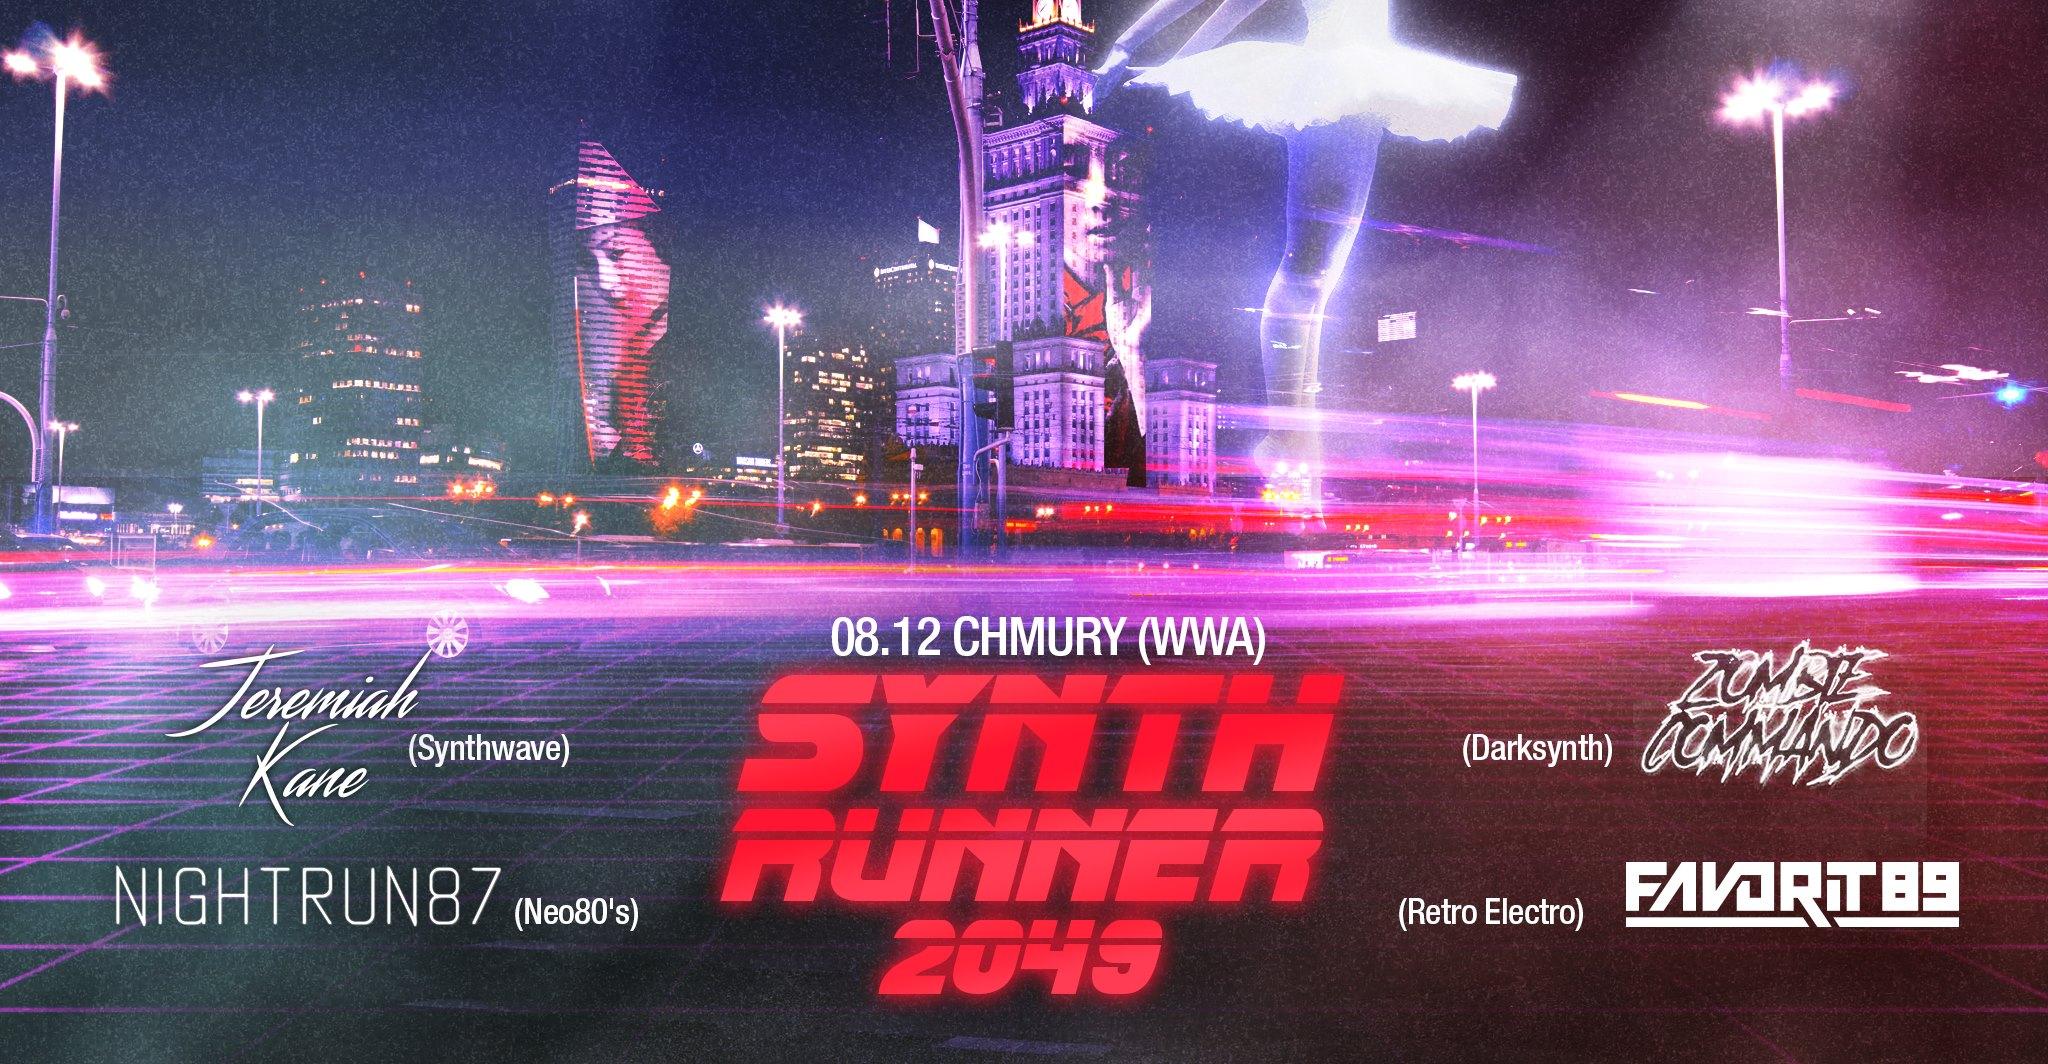 SynthRunner 2049 (Chmury - Warszawa - 08.12.2017)